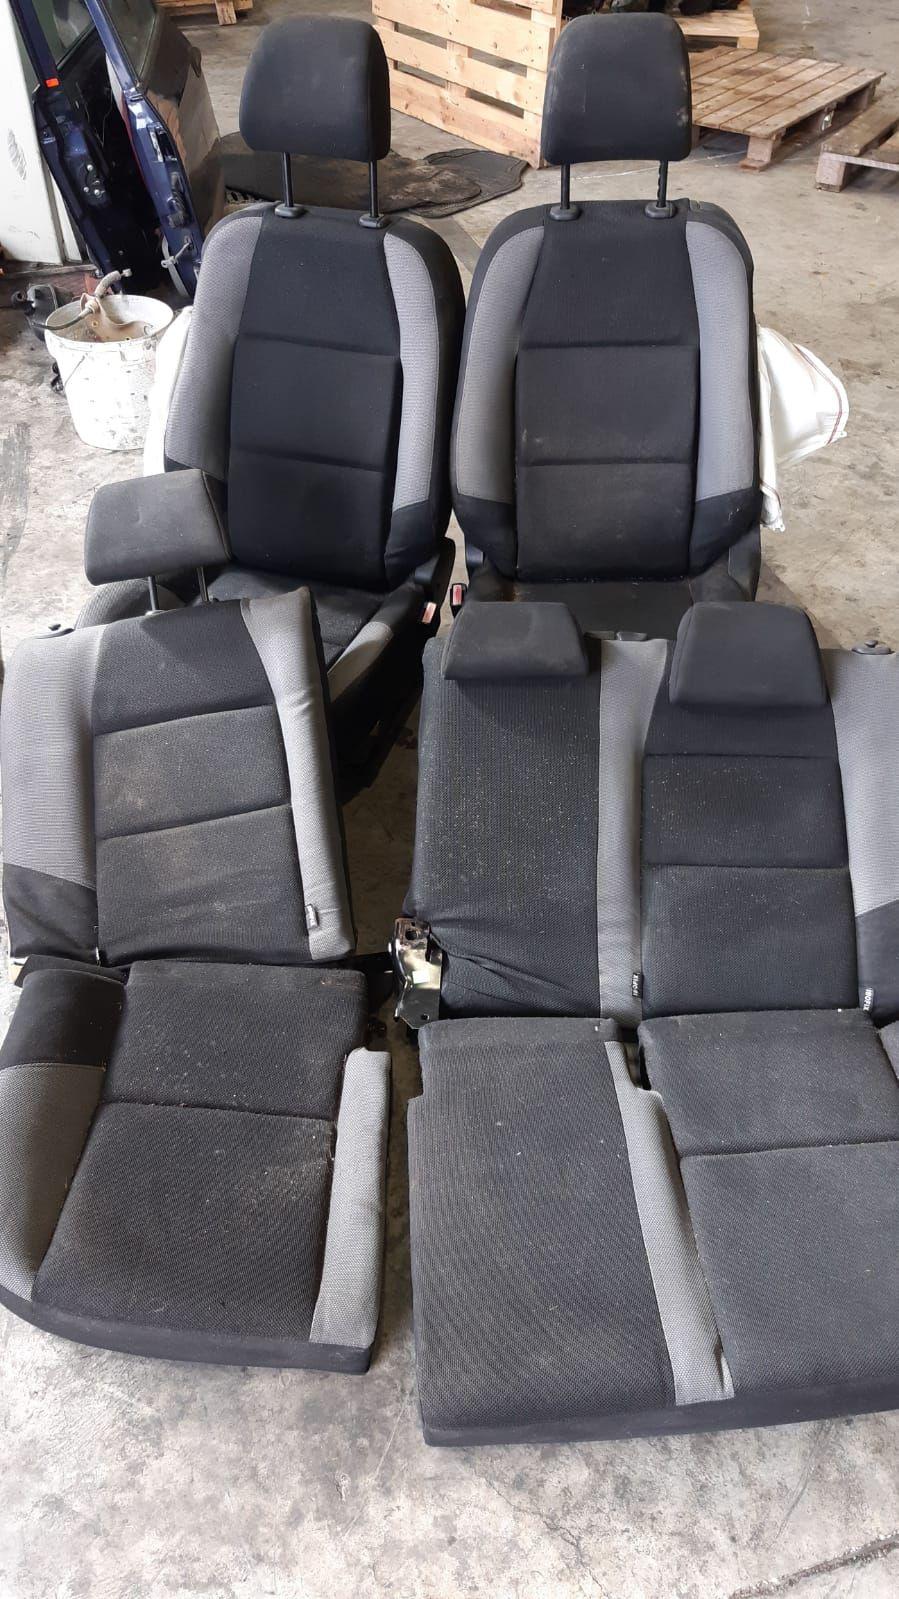 TAPPEZZERIA COMPLETA PEUGEOT 207 1° Serie Benzina  (2008) RICAMBI USATI